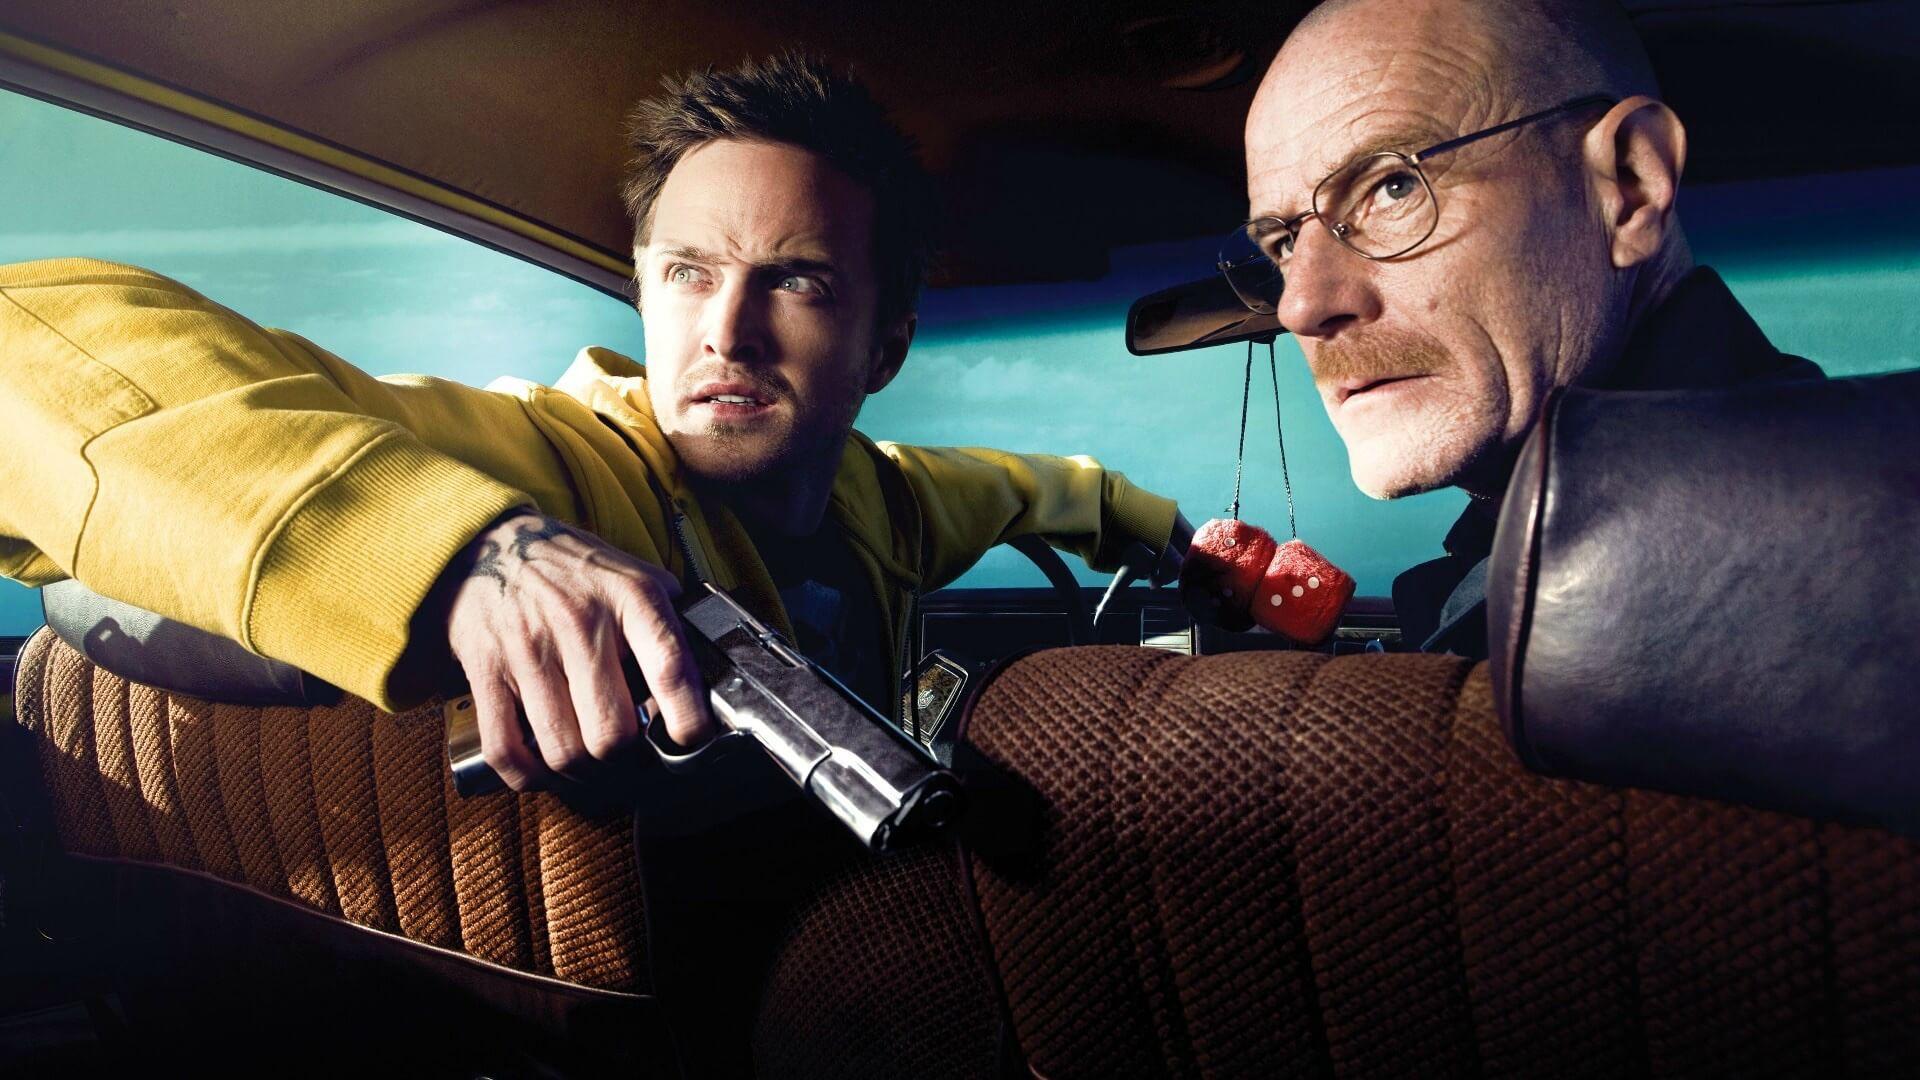 AMC 頻道影集《絕命毒師》據傳即將推出電影版。